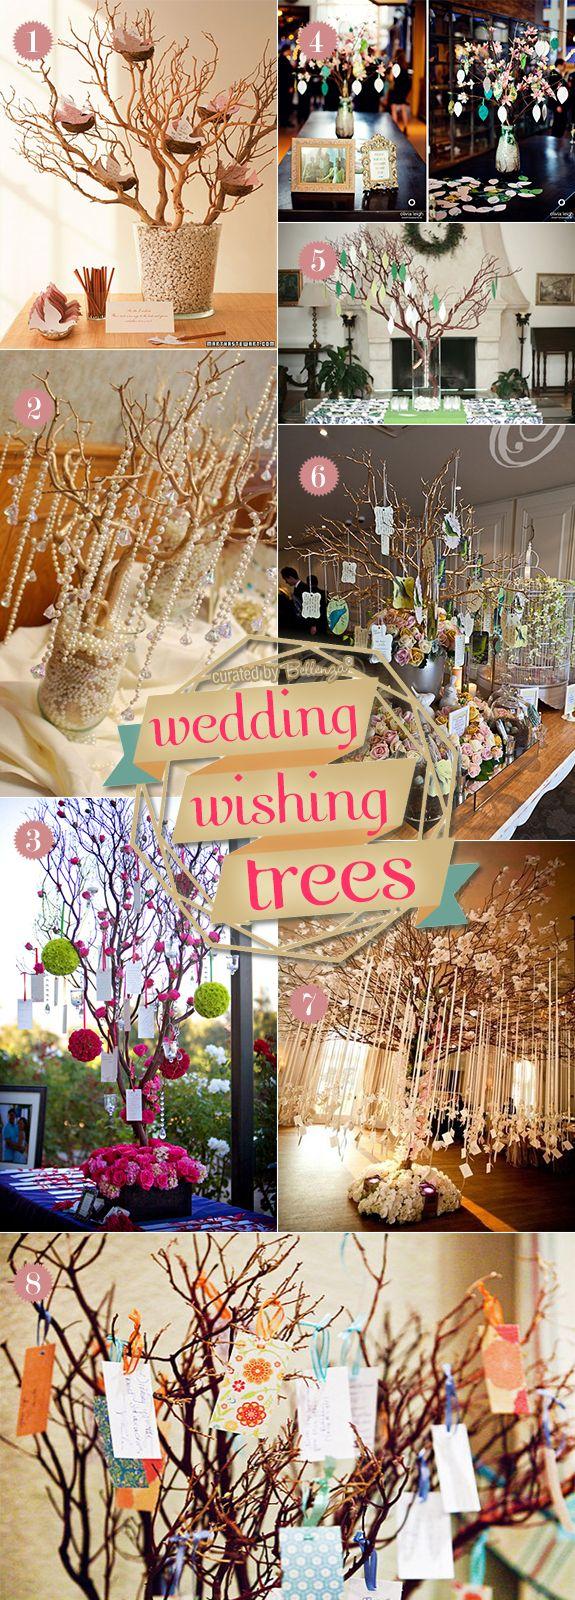 Creative Decor Ideas For Presenting Wedding Wish Trees